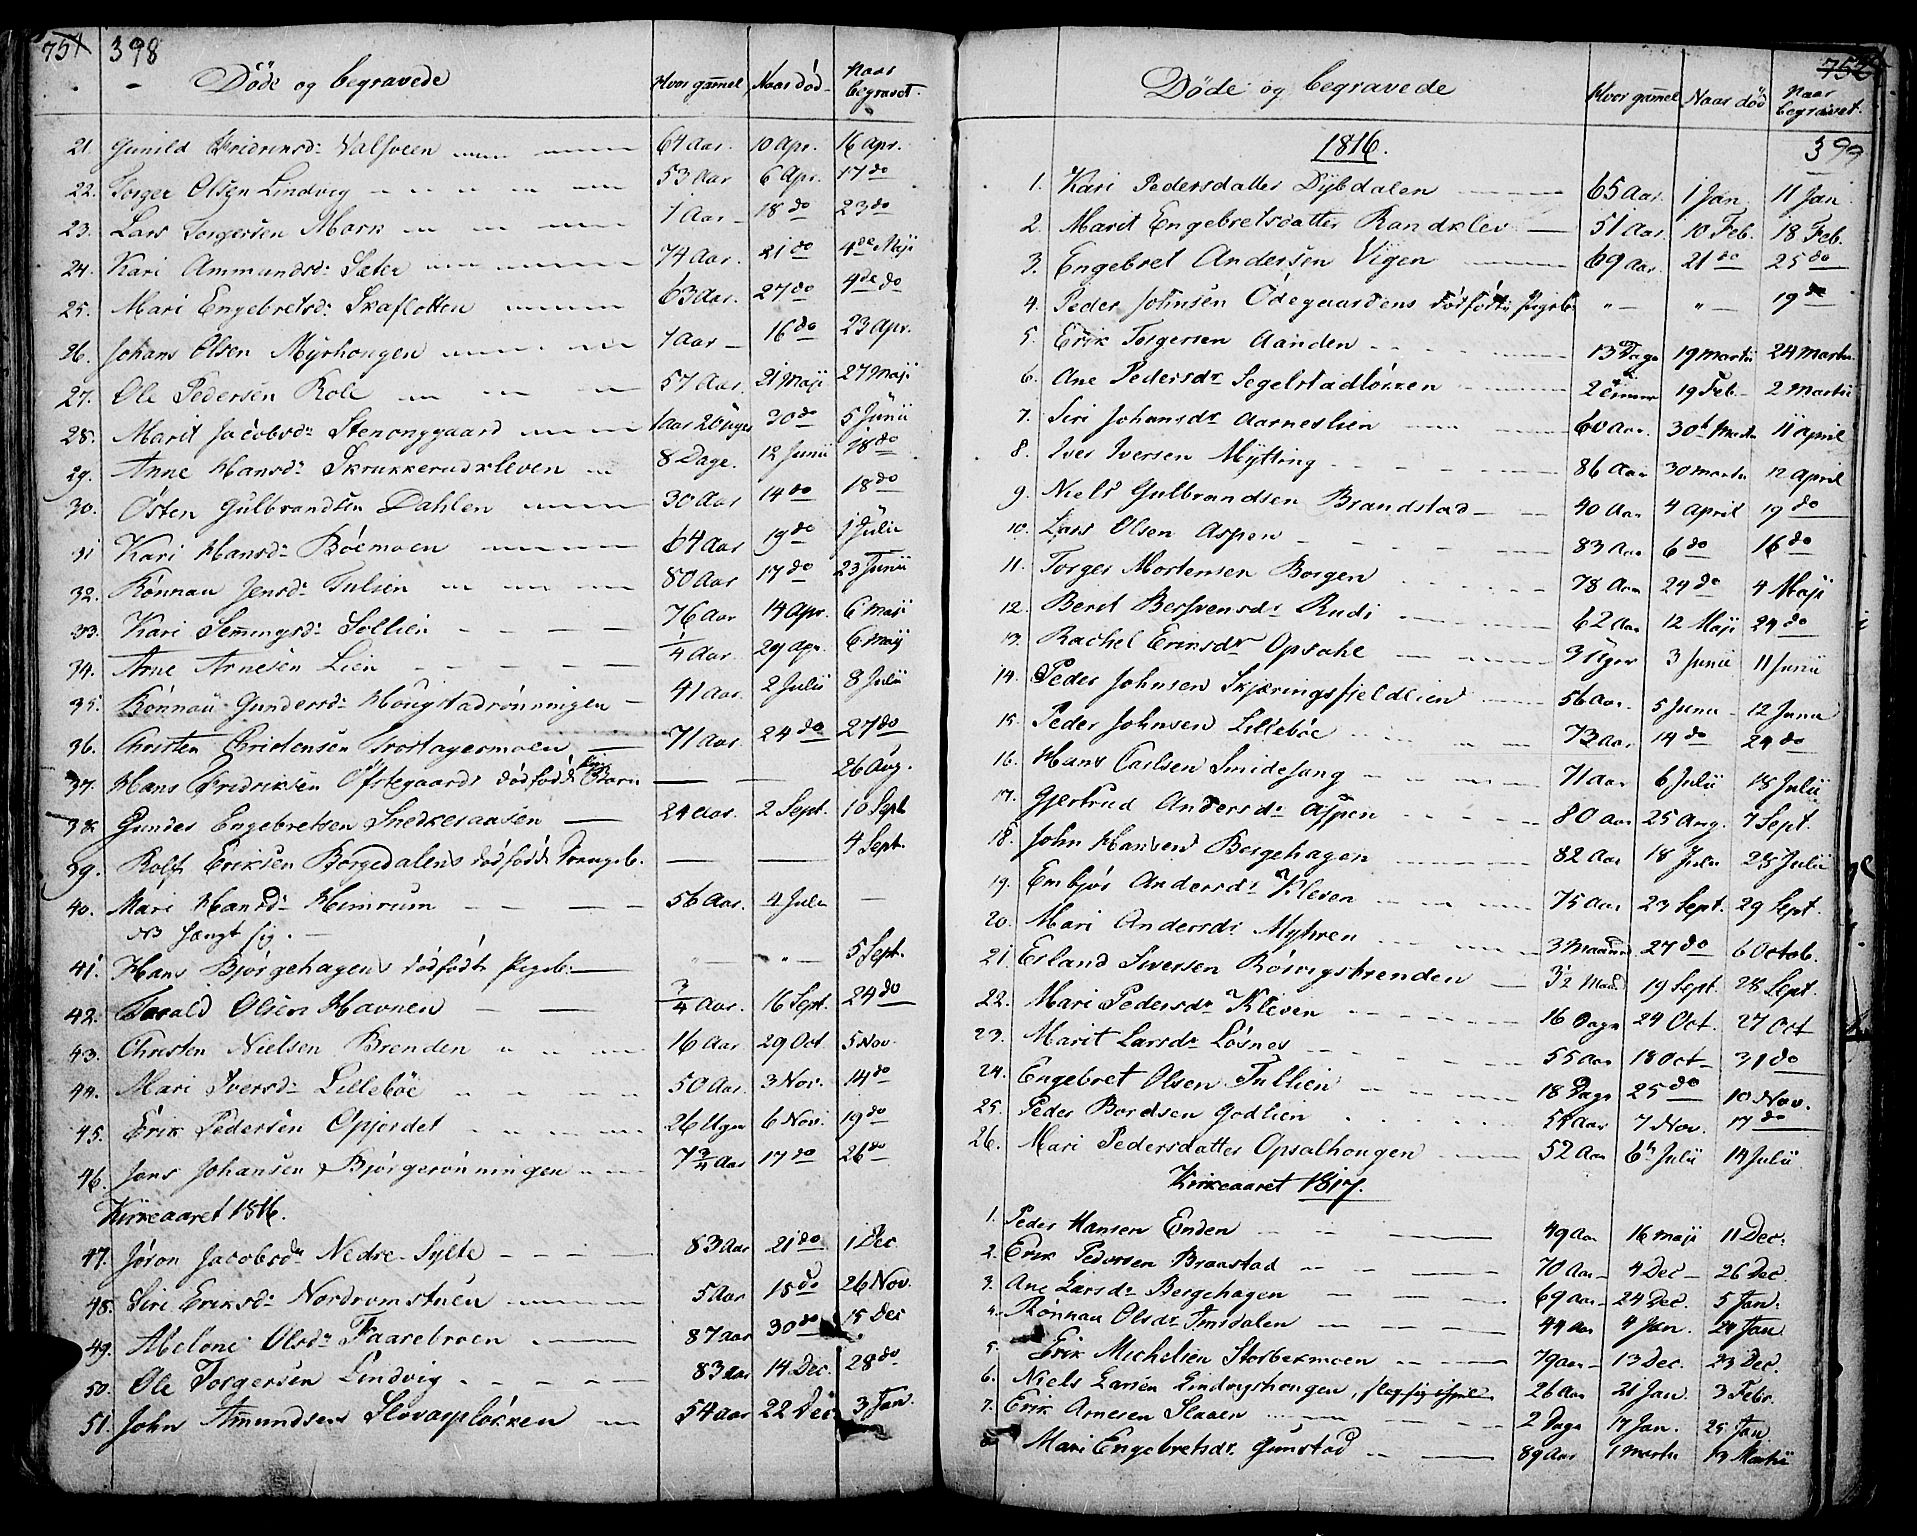 SAH, Ringebu prestekontor, Ministerialbok nr. 3, 1781-1820, s. 398-399